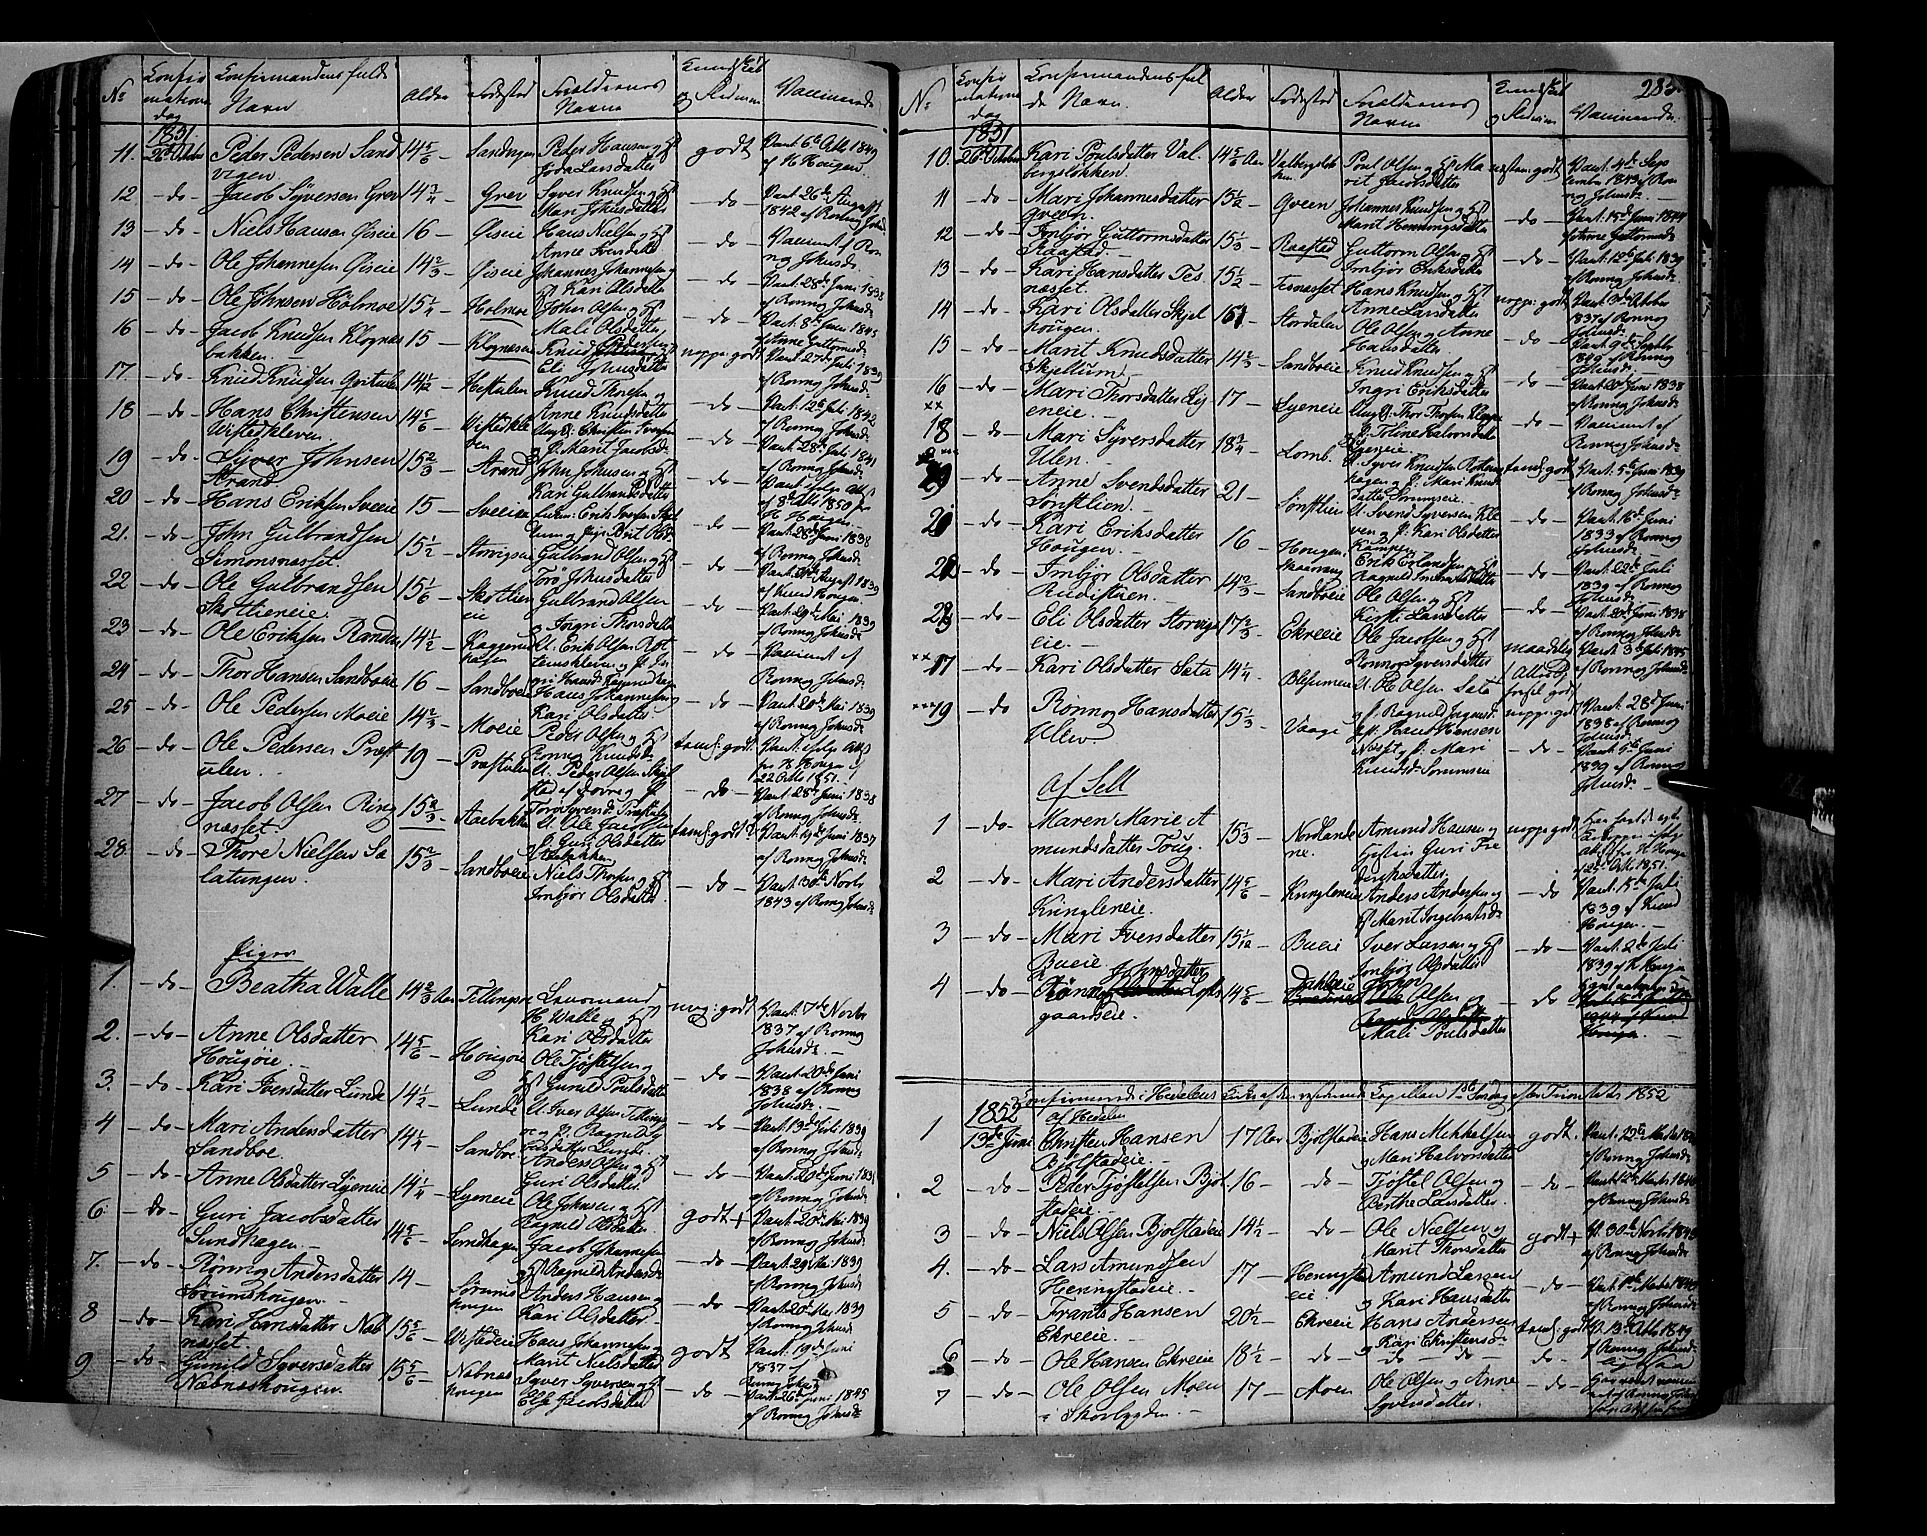 SAH, Vågå prestekontor, Ministerialbok nr. 5 /1, 1842-1856, s. 285